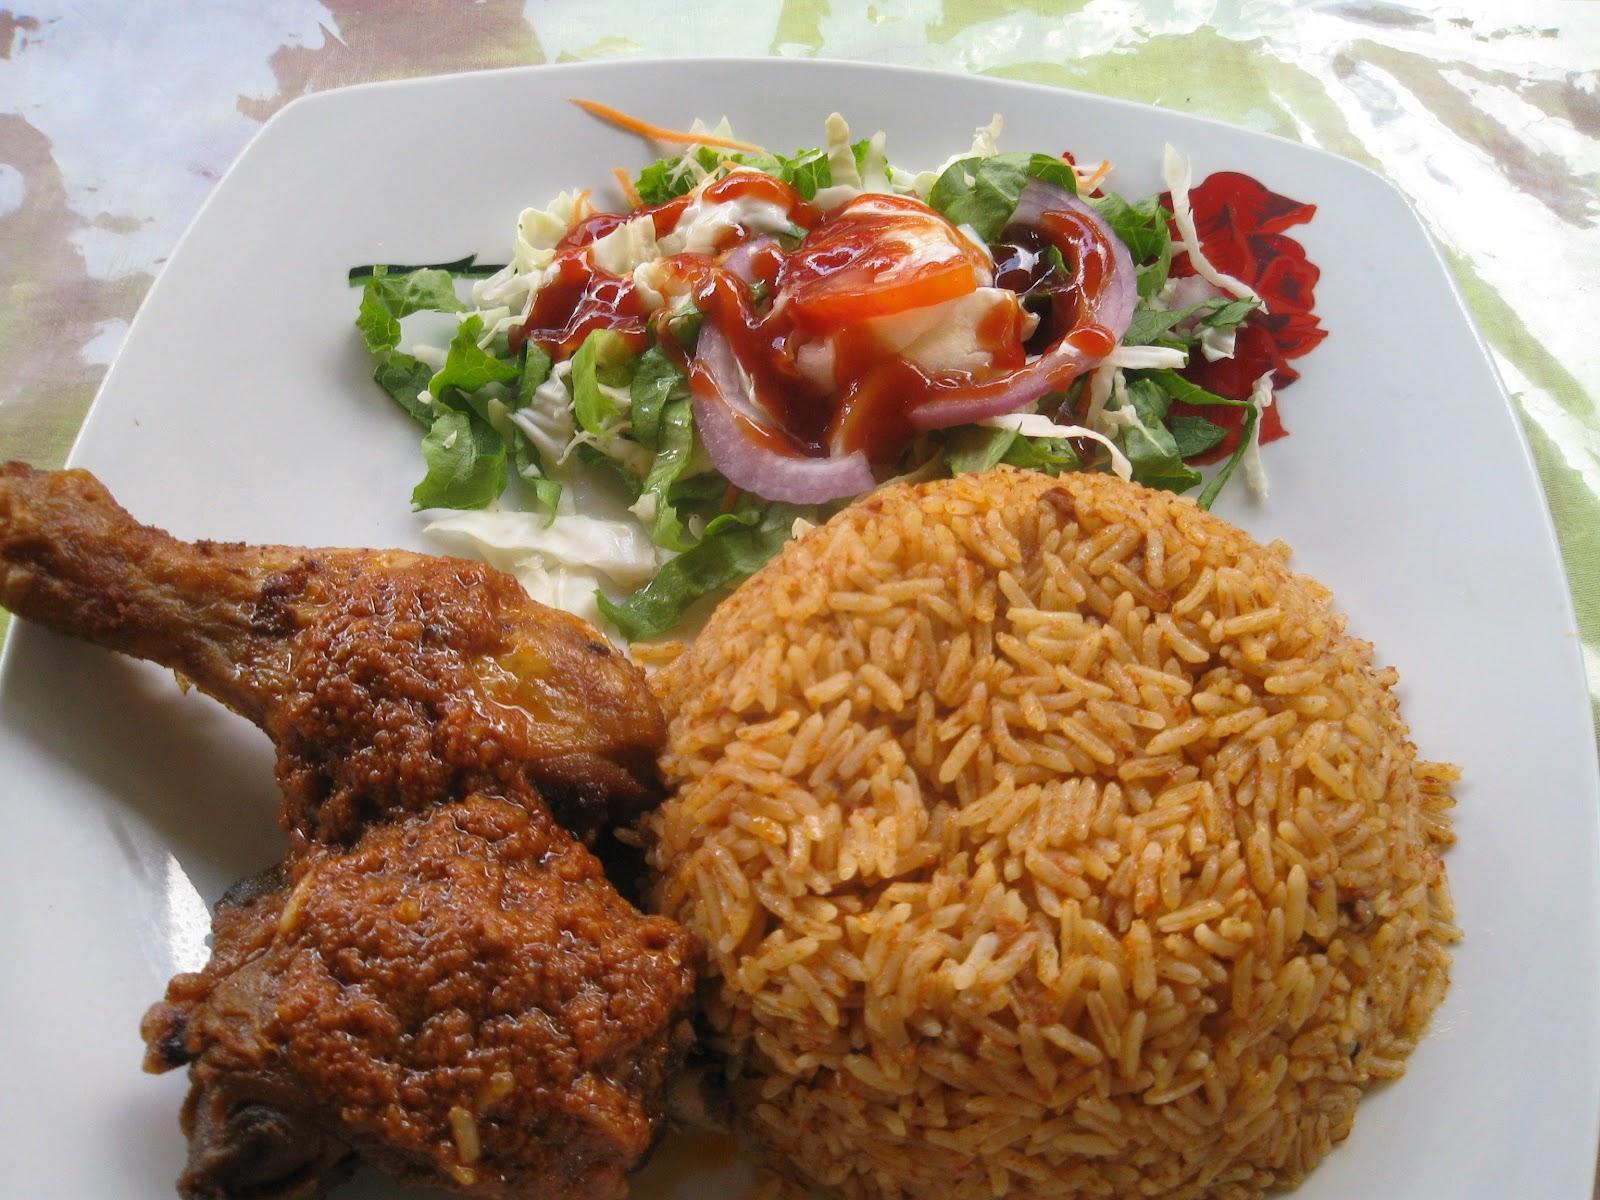 Easy Jollof Rice with Fried Plantain and Roast Chicken ...  |Chicken And Jollof Rice